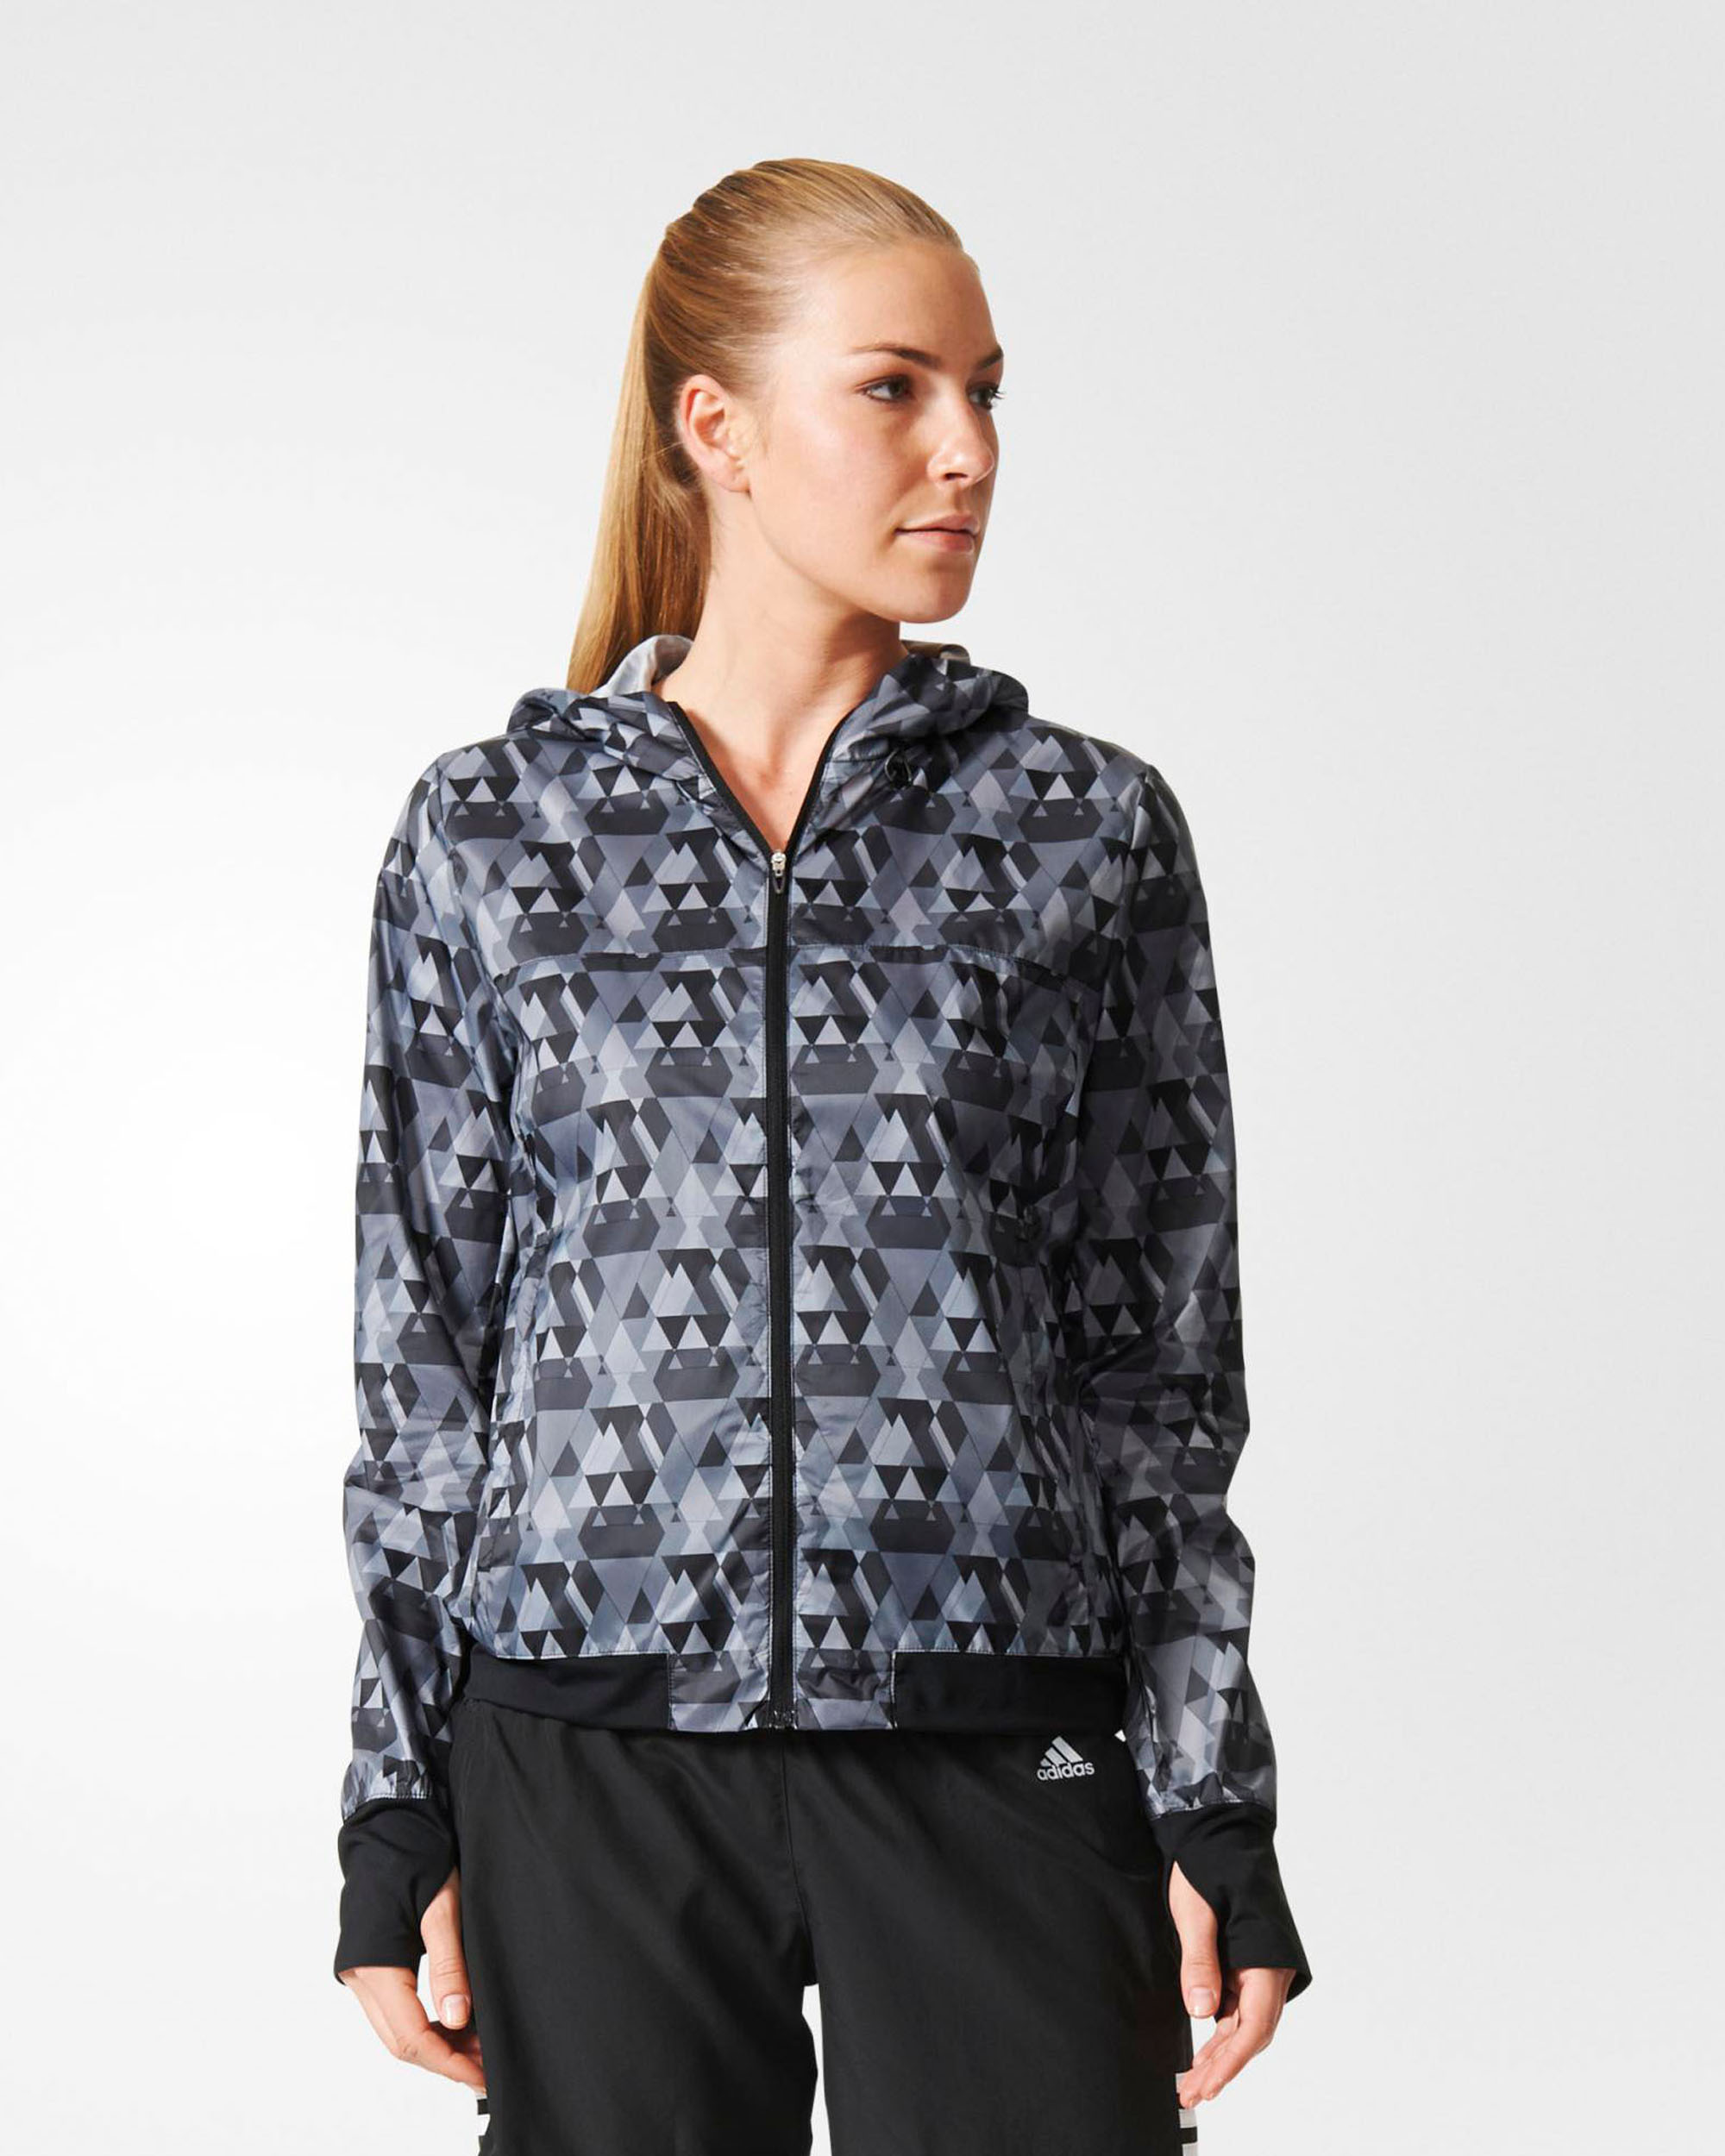 adidas Womens Performance Run Graphic Jacket Tights.no